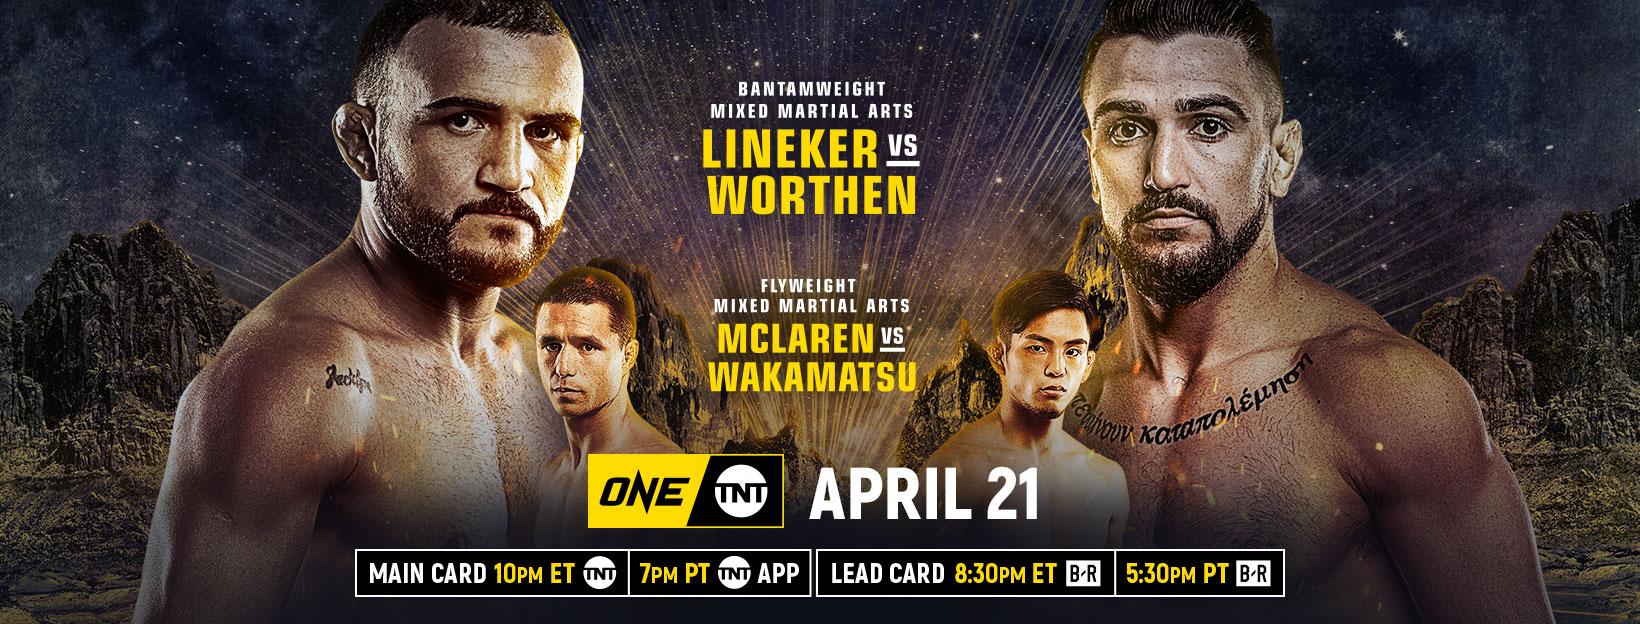 Lineker vs Worthen